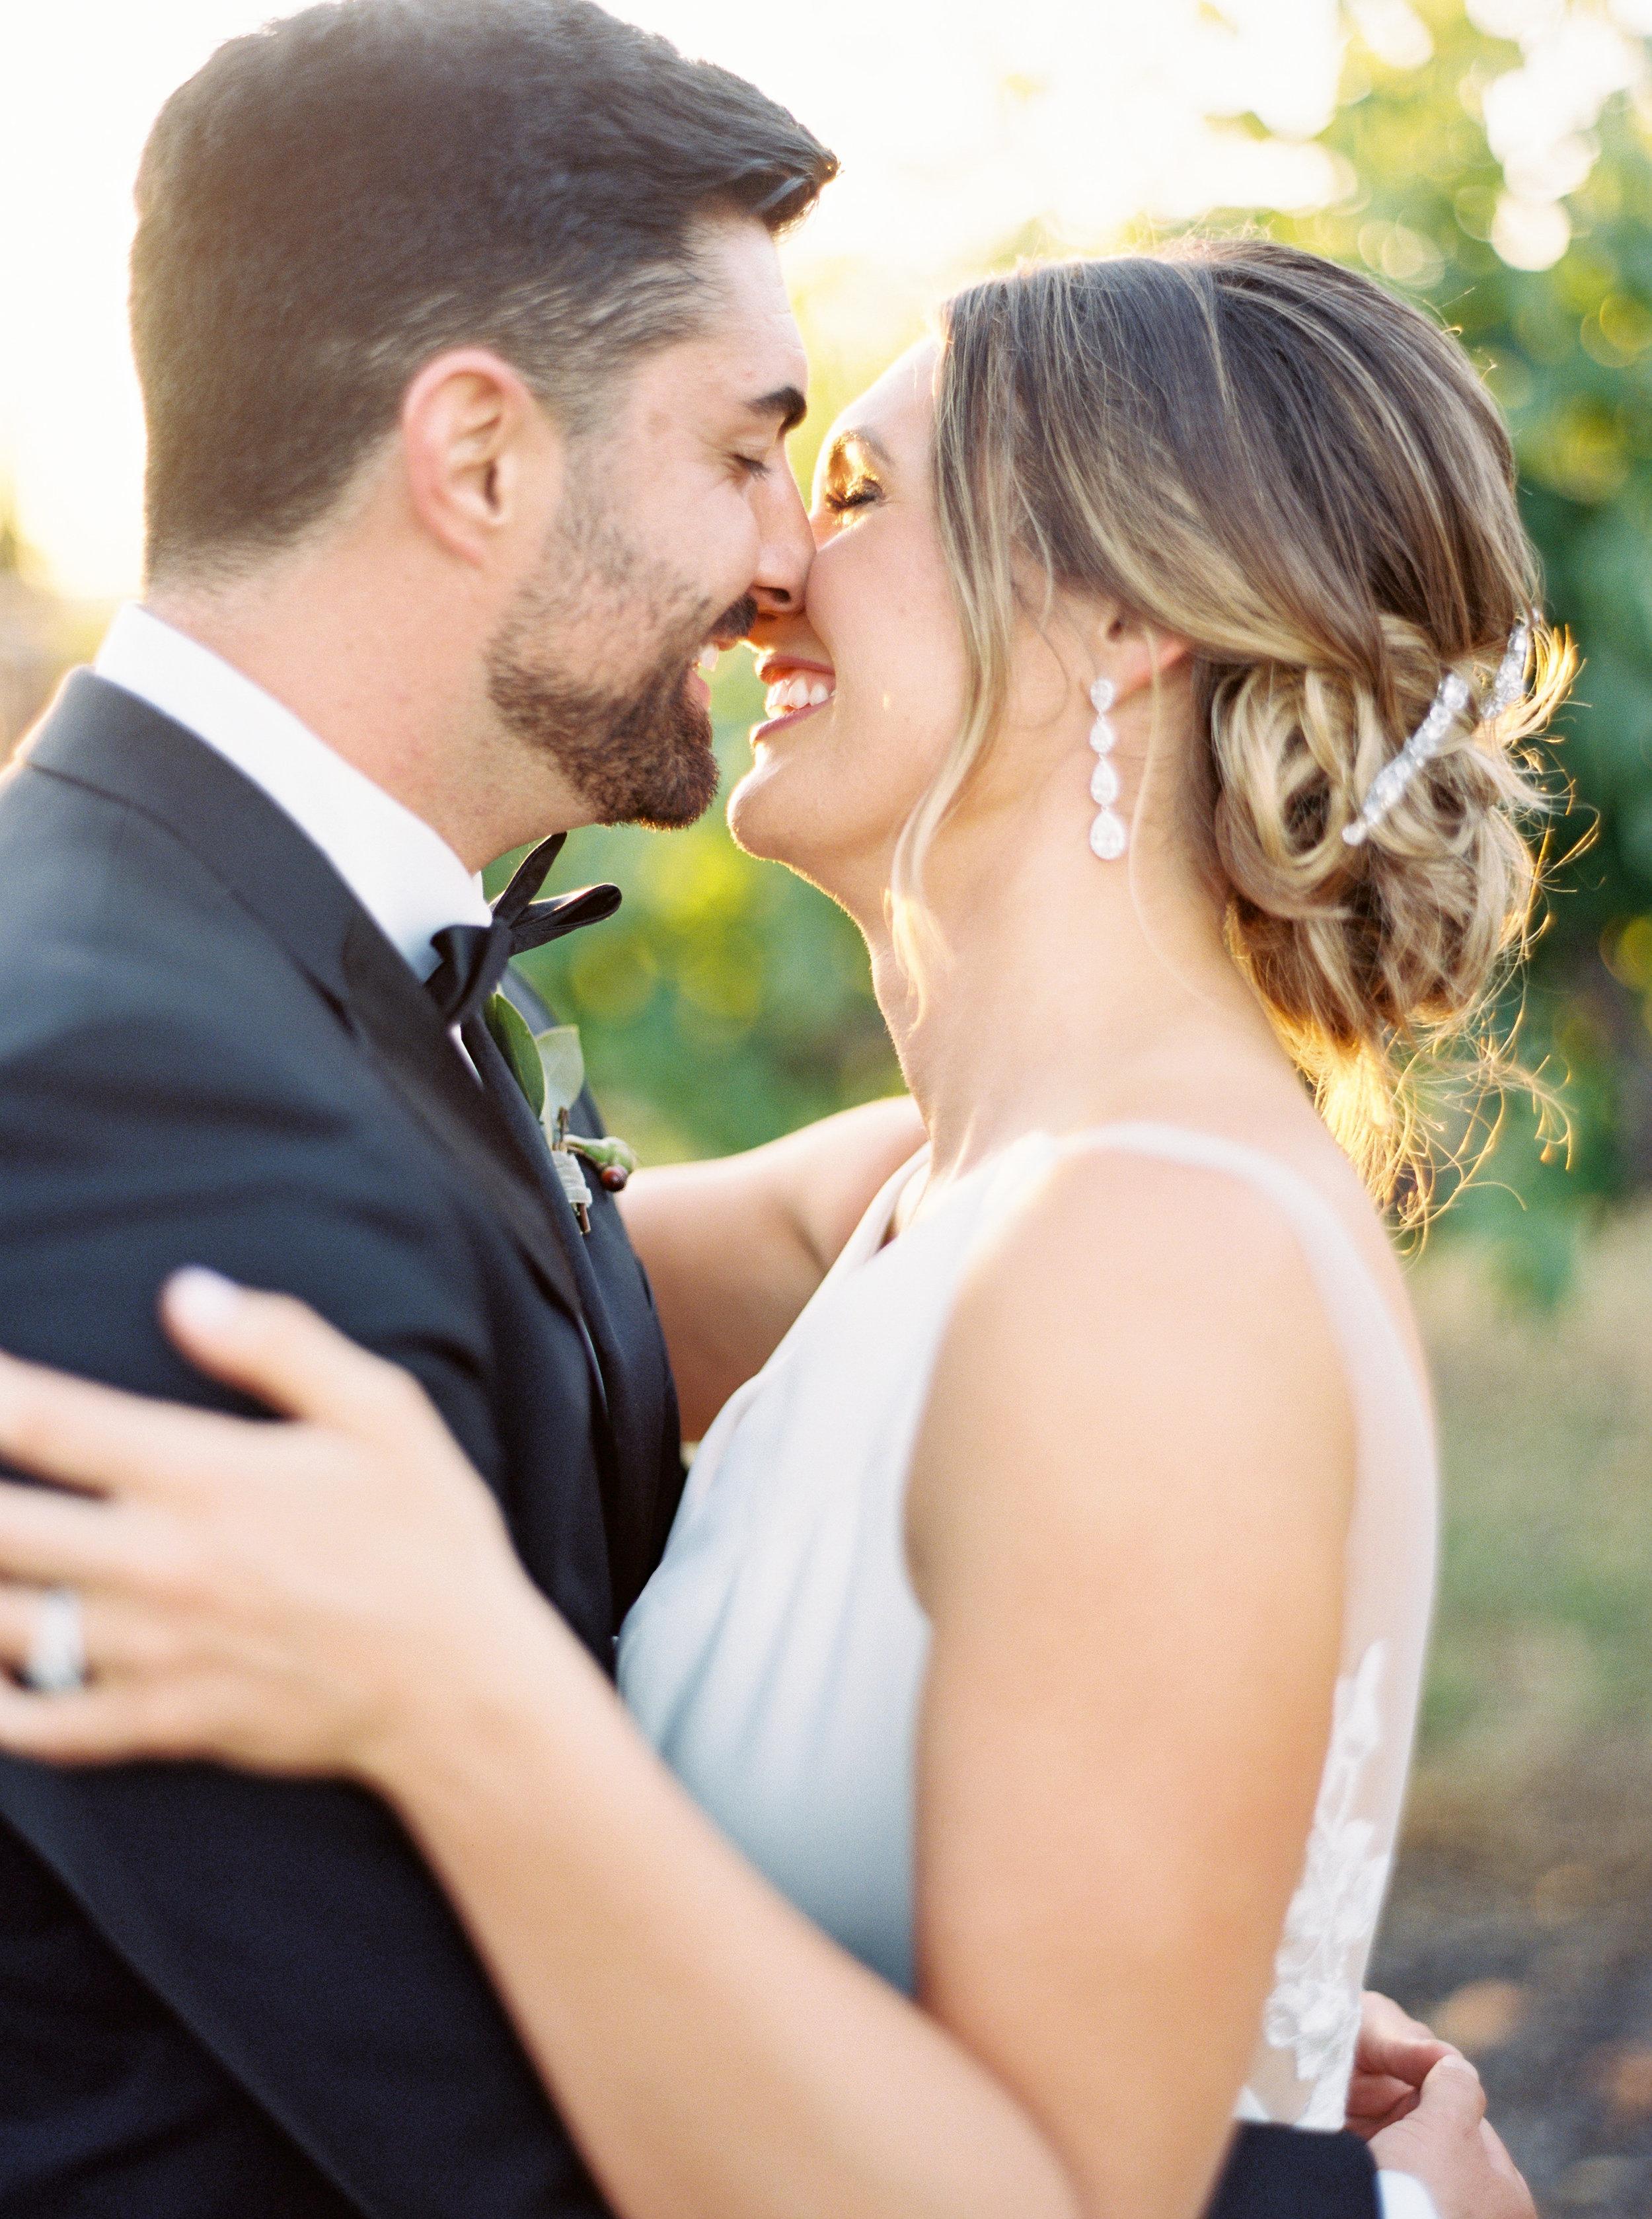 vintners-inn-wedding-in-santa-rosa-california-206.jpg